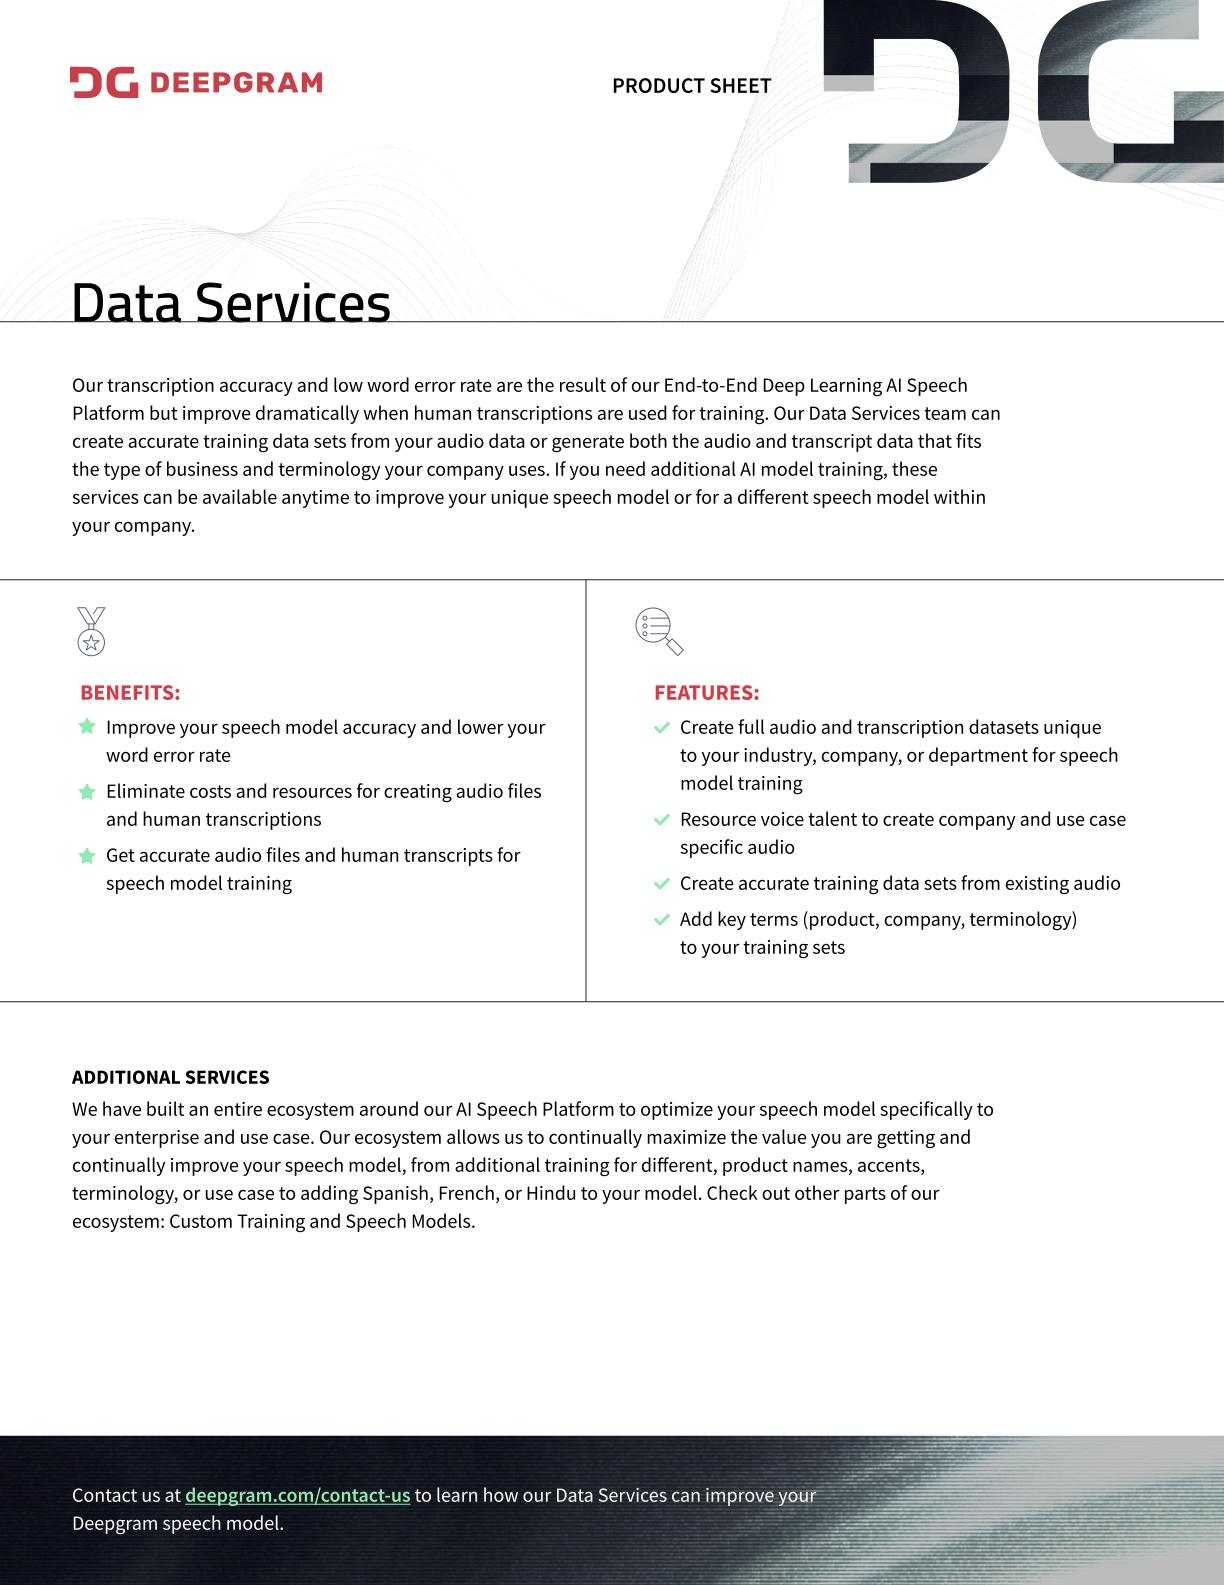 Deepgram-Data Services-Product Sheet